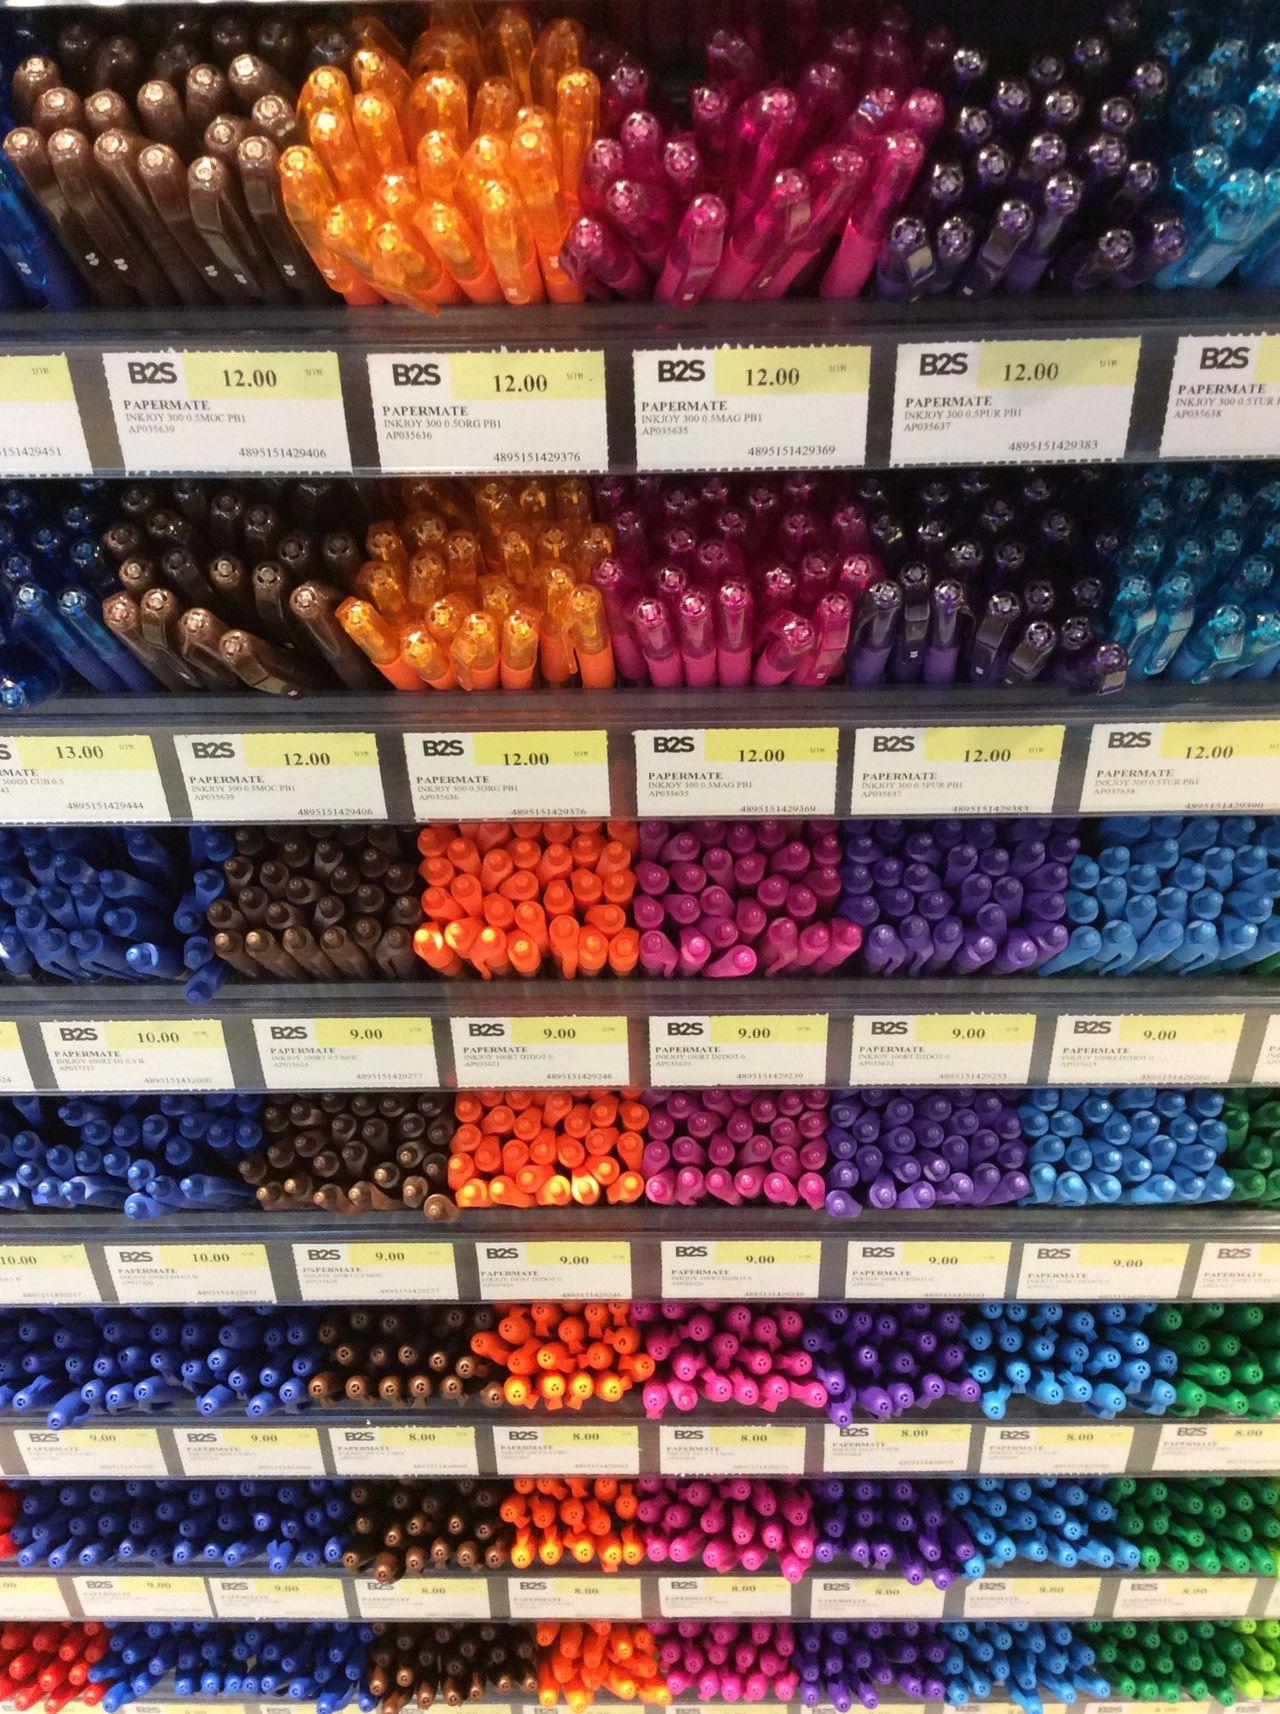 Central World BKK. B&S coloured marker pens Price Labels Thai infomation School Pens Thailand Stationary